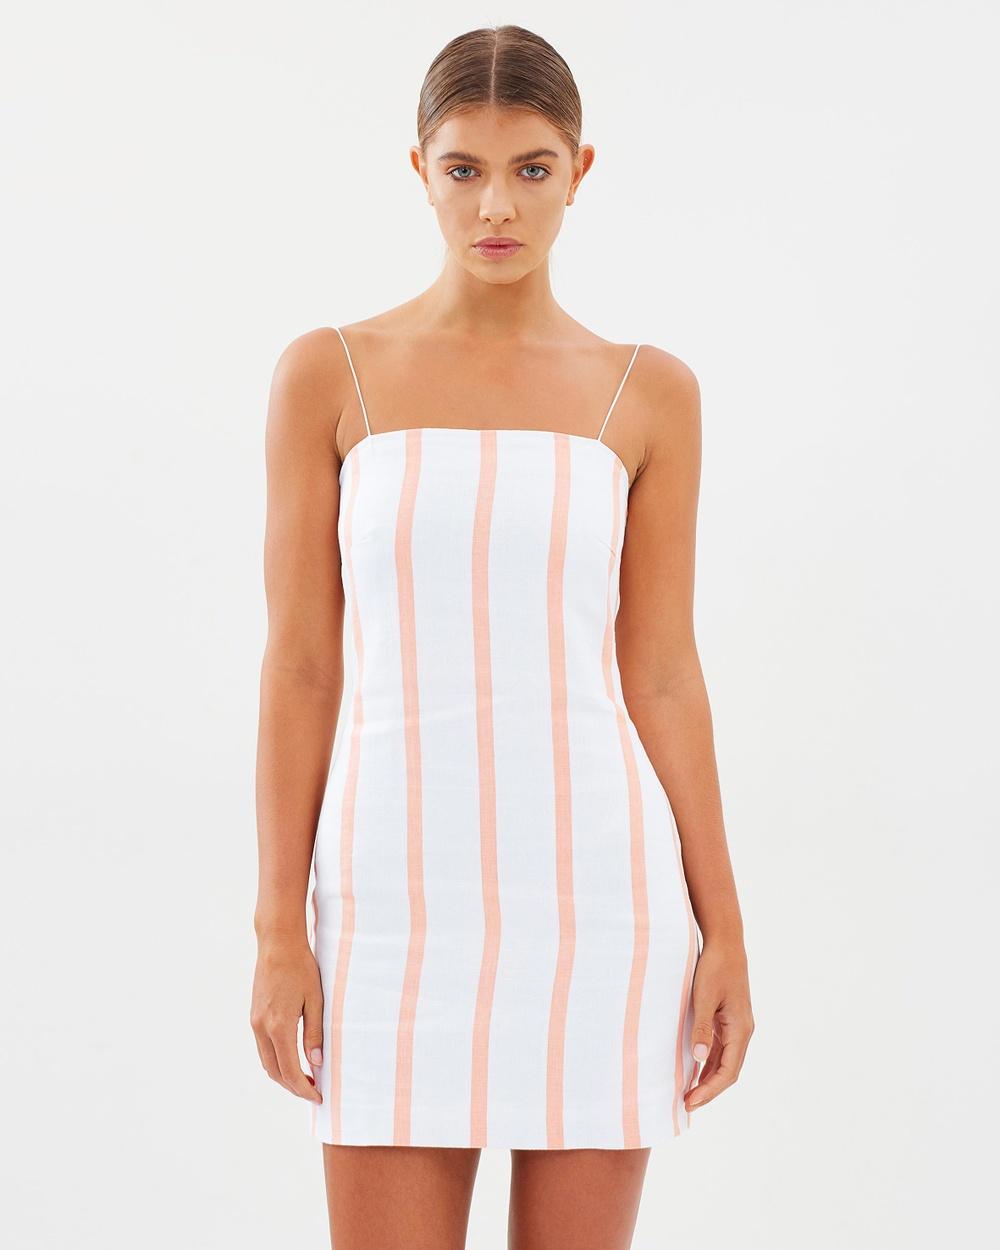 Maurie & Eve Pascal Dress Dresses Vradi Stripe Pascal Dress